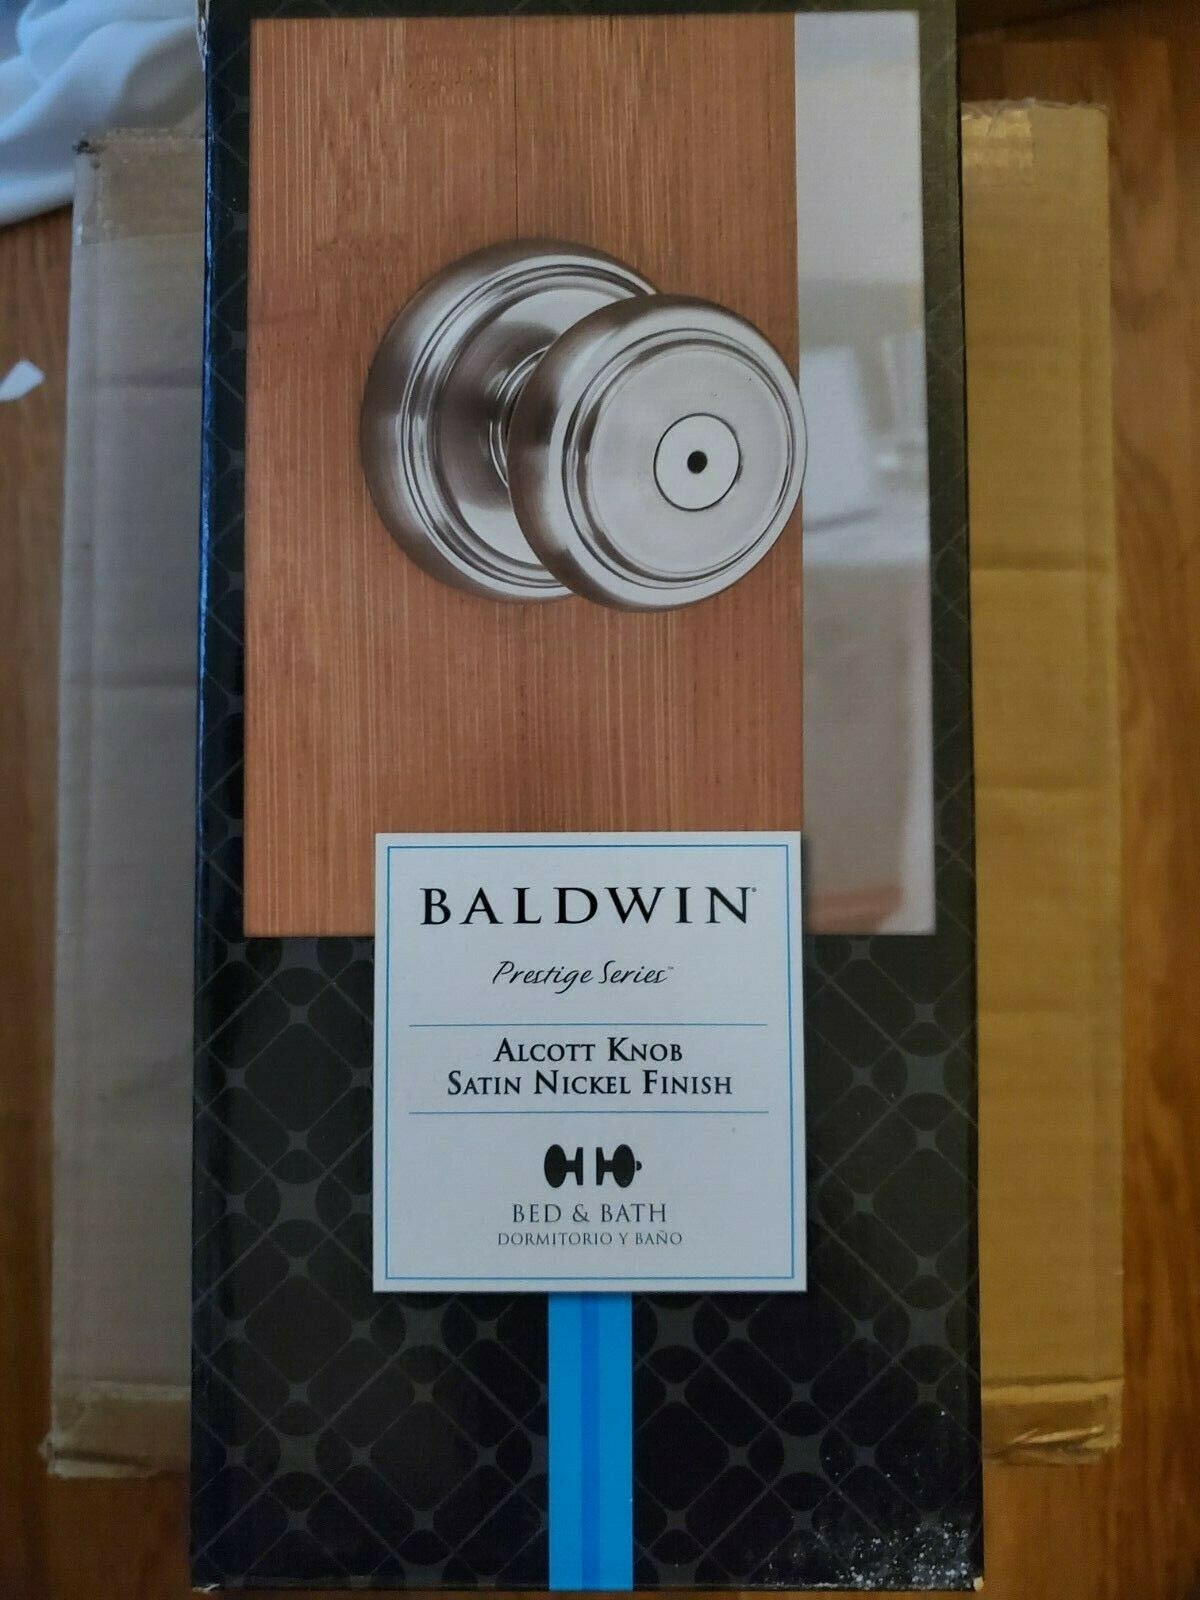 Baldwin Alcott Knob Prestige Series